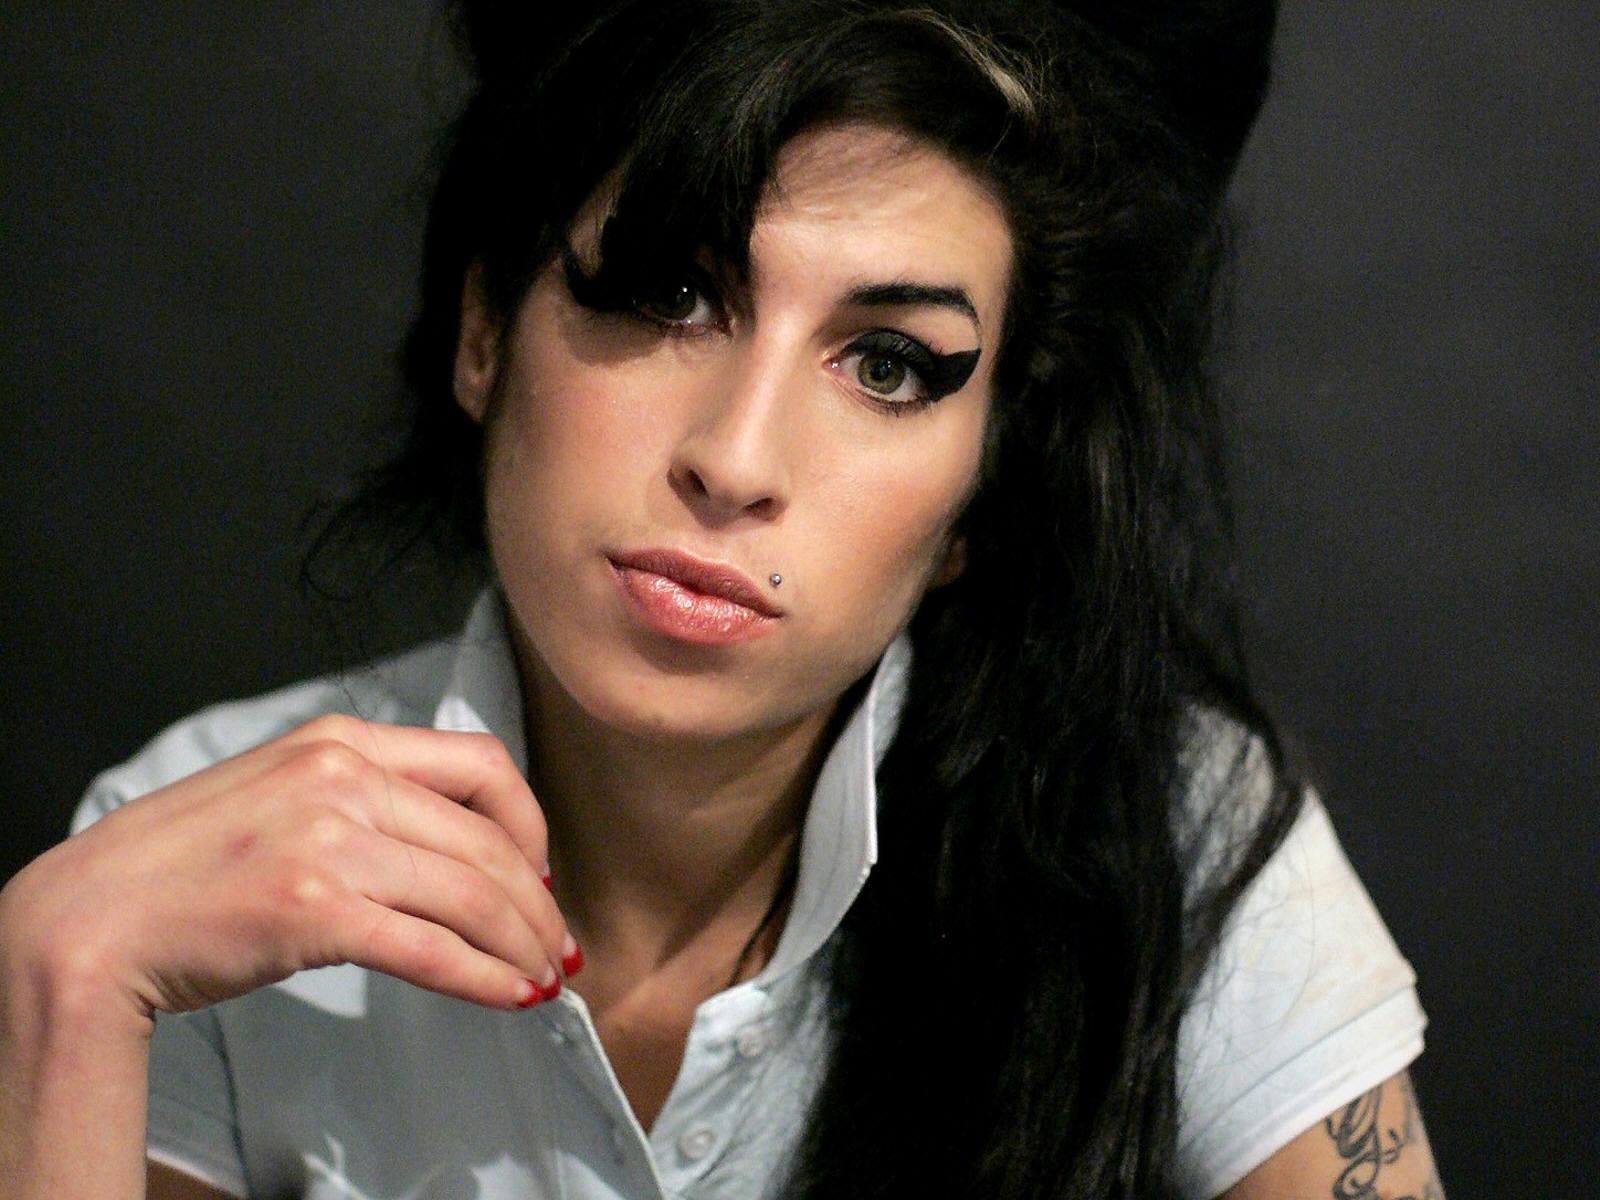 http://2.bp.blogspot.com/-G0kJtLXPoFM/TwCSC4qWcbI/AAAAAAAAH9Y/CxwgD-2kz6w/s1600/Amy-Winehouse-Divulga%25C3%25A7%25C3%25A3o1.jpg